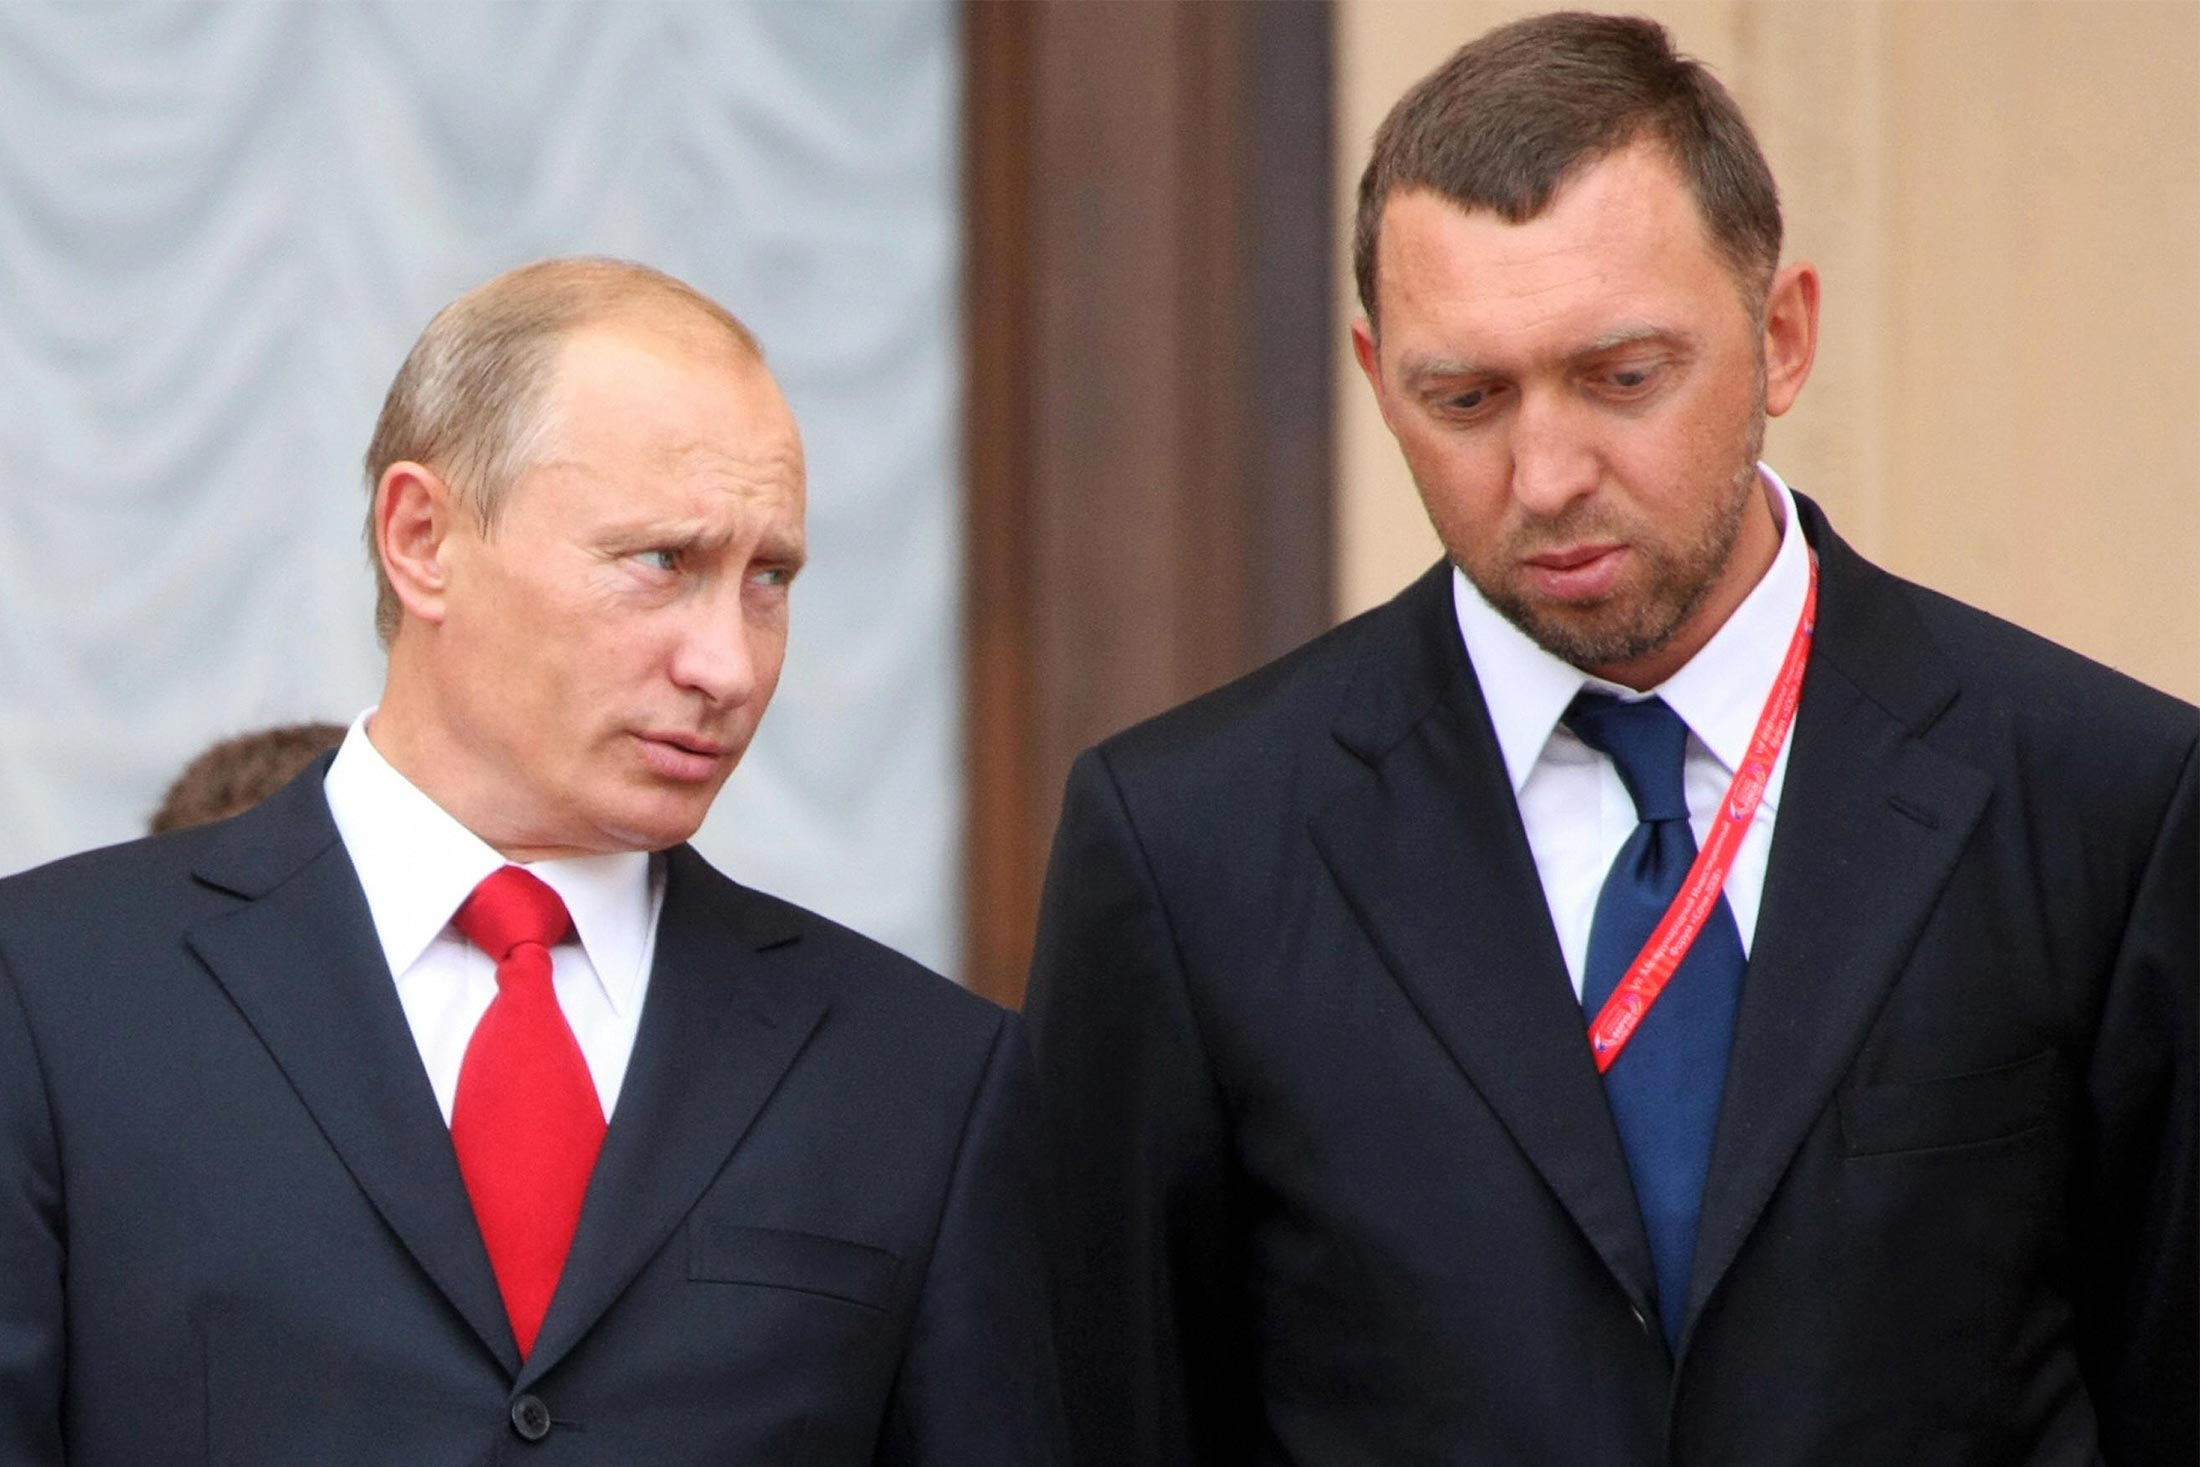 bloomberg.com - Yuliya Fedorinova - U.S. Sanctions Are Driving Russian Billionaires Into Putin's Arms